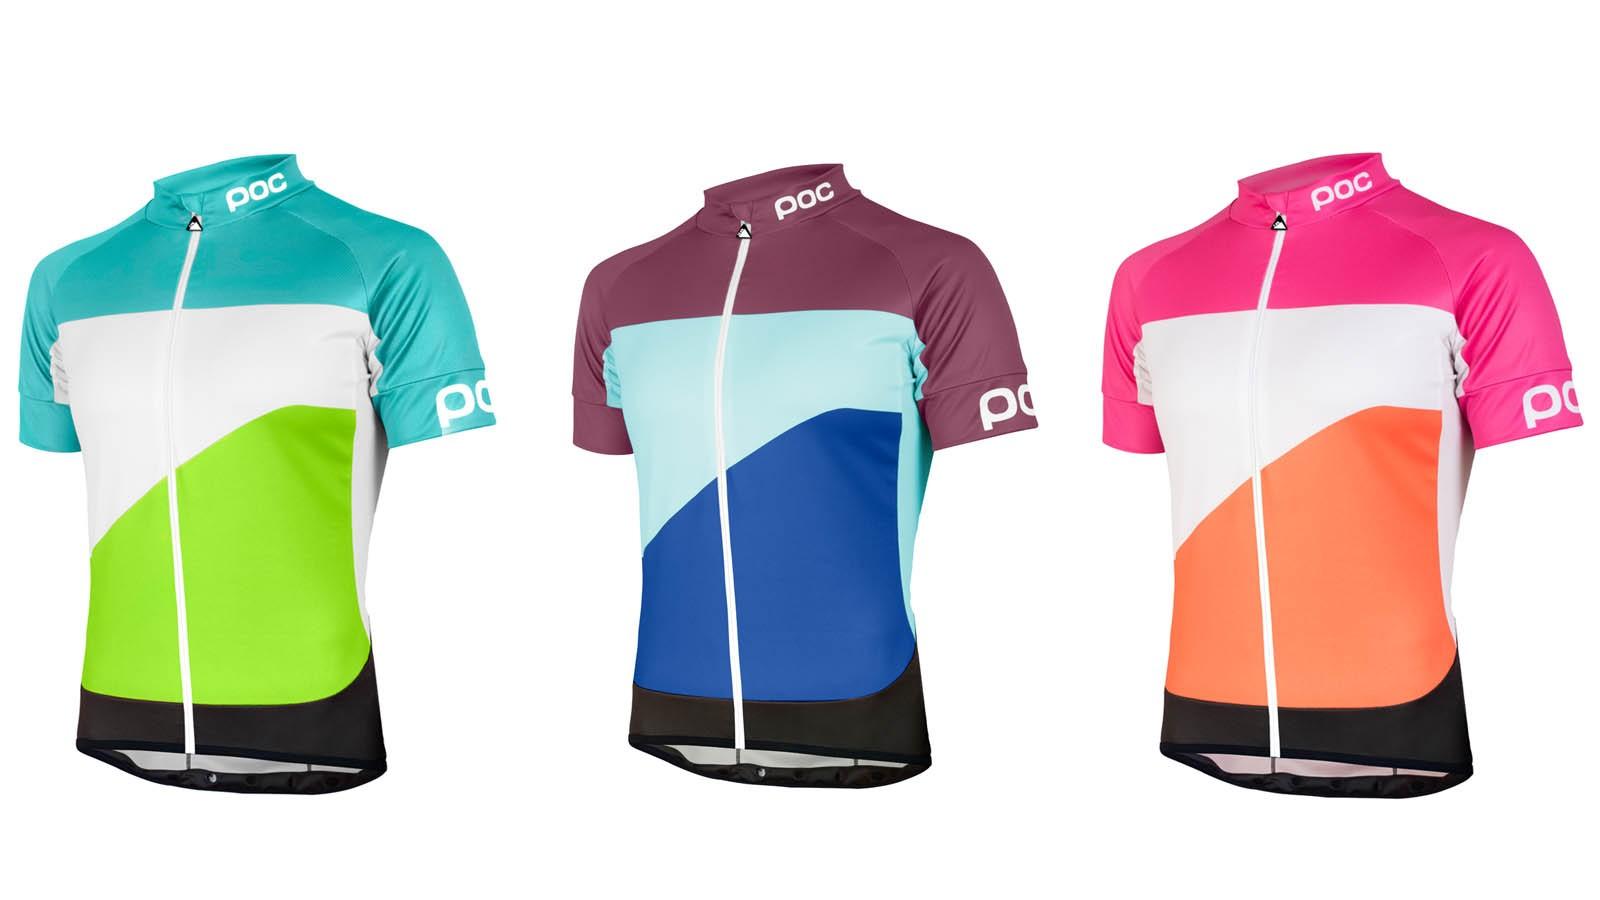 POC's new Fondo gradient jerseys celebrate the Passo dello Stelvio, Alpe d'Huez and Muur van Geraardsbergen